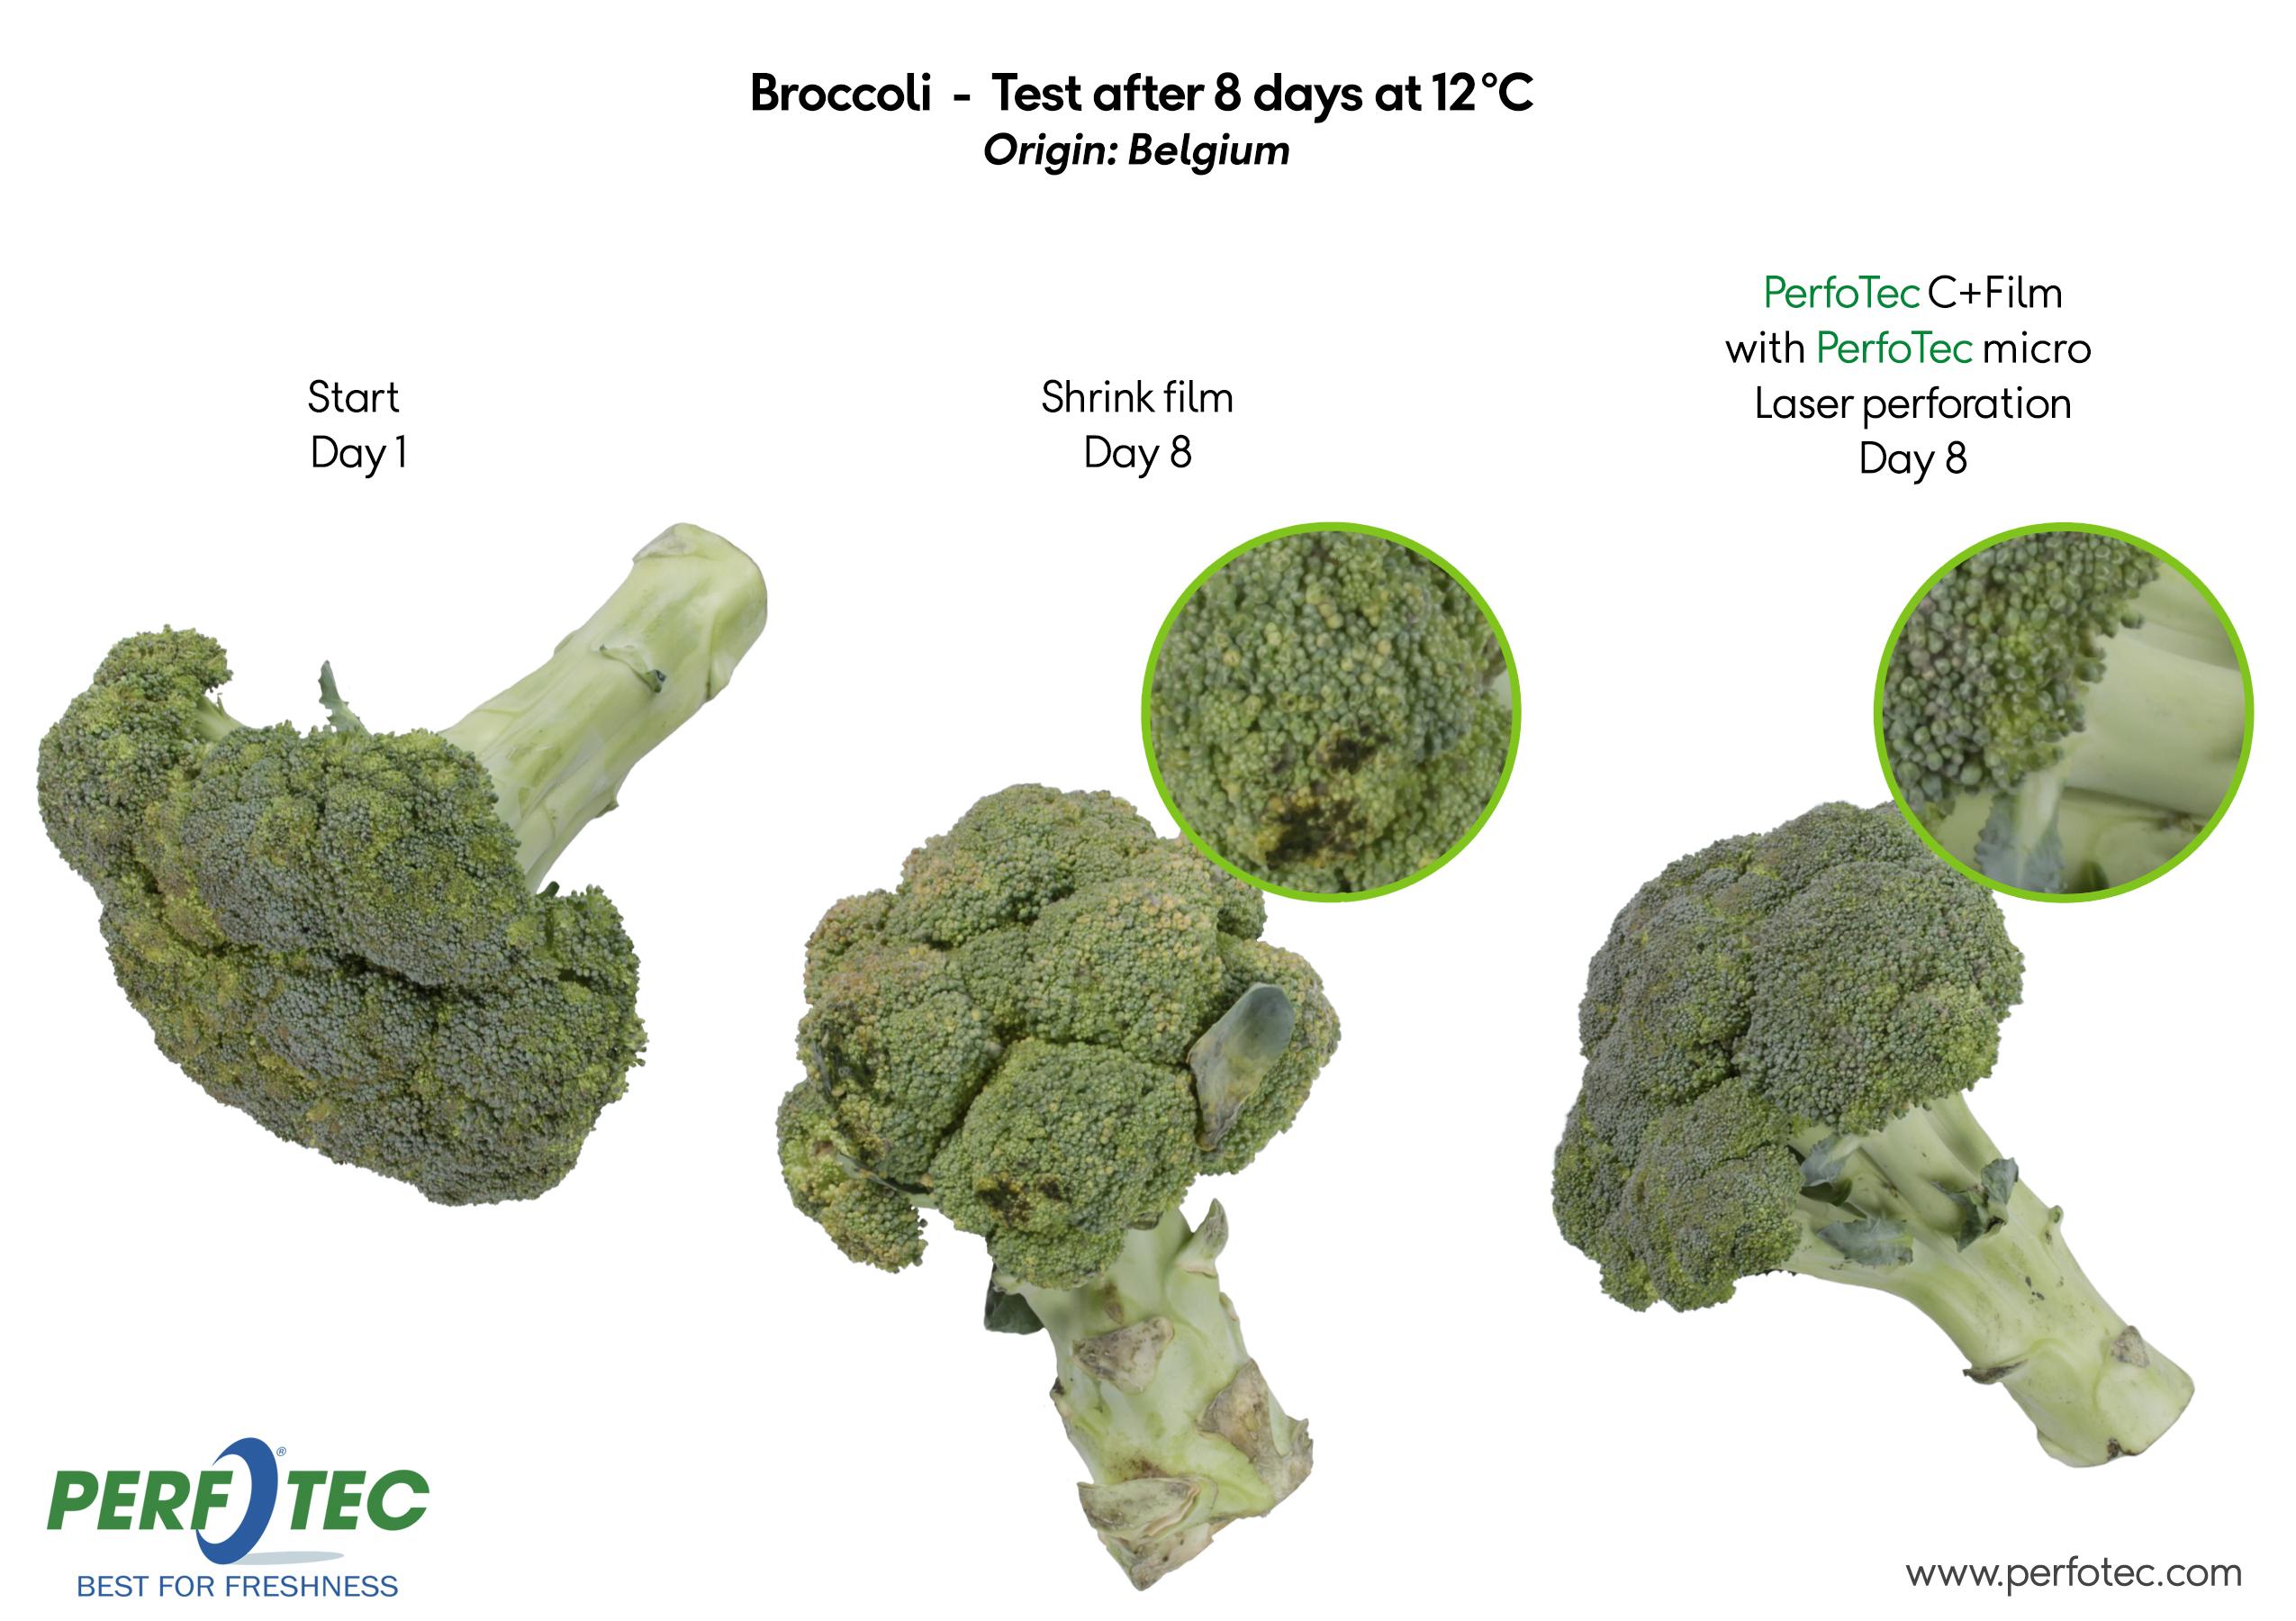 Broccoli in PerfoTec C+ Film